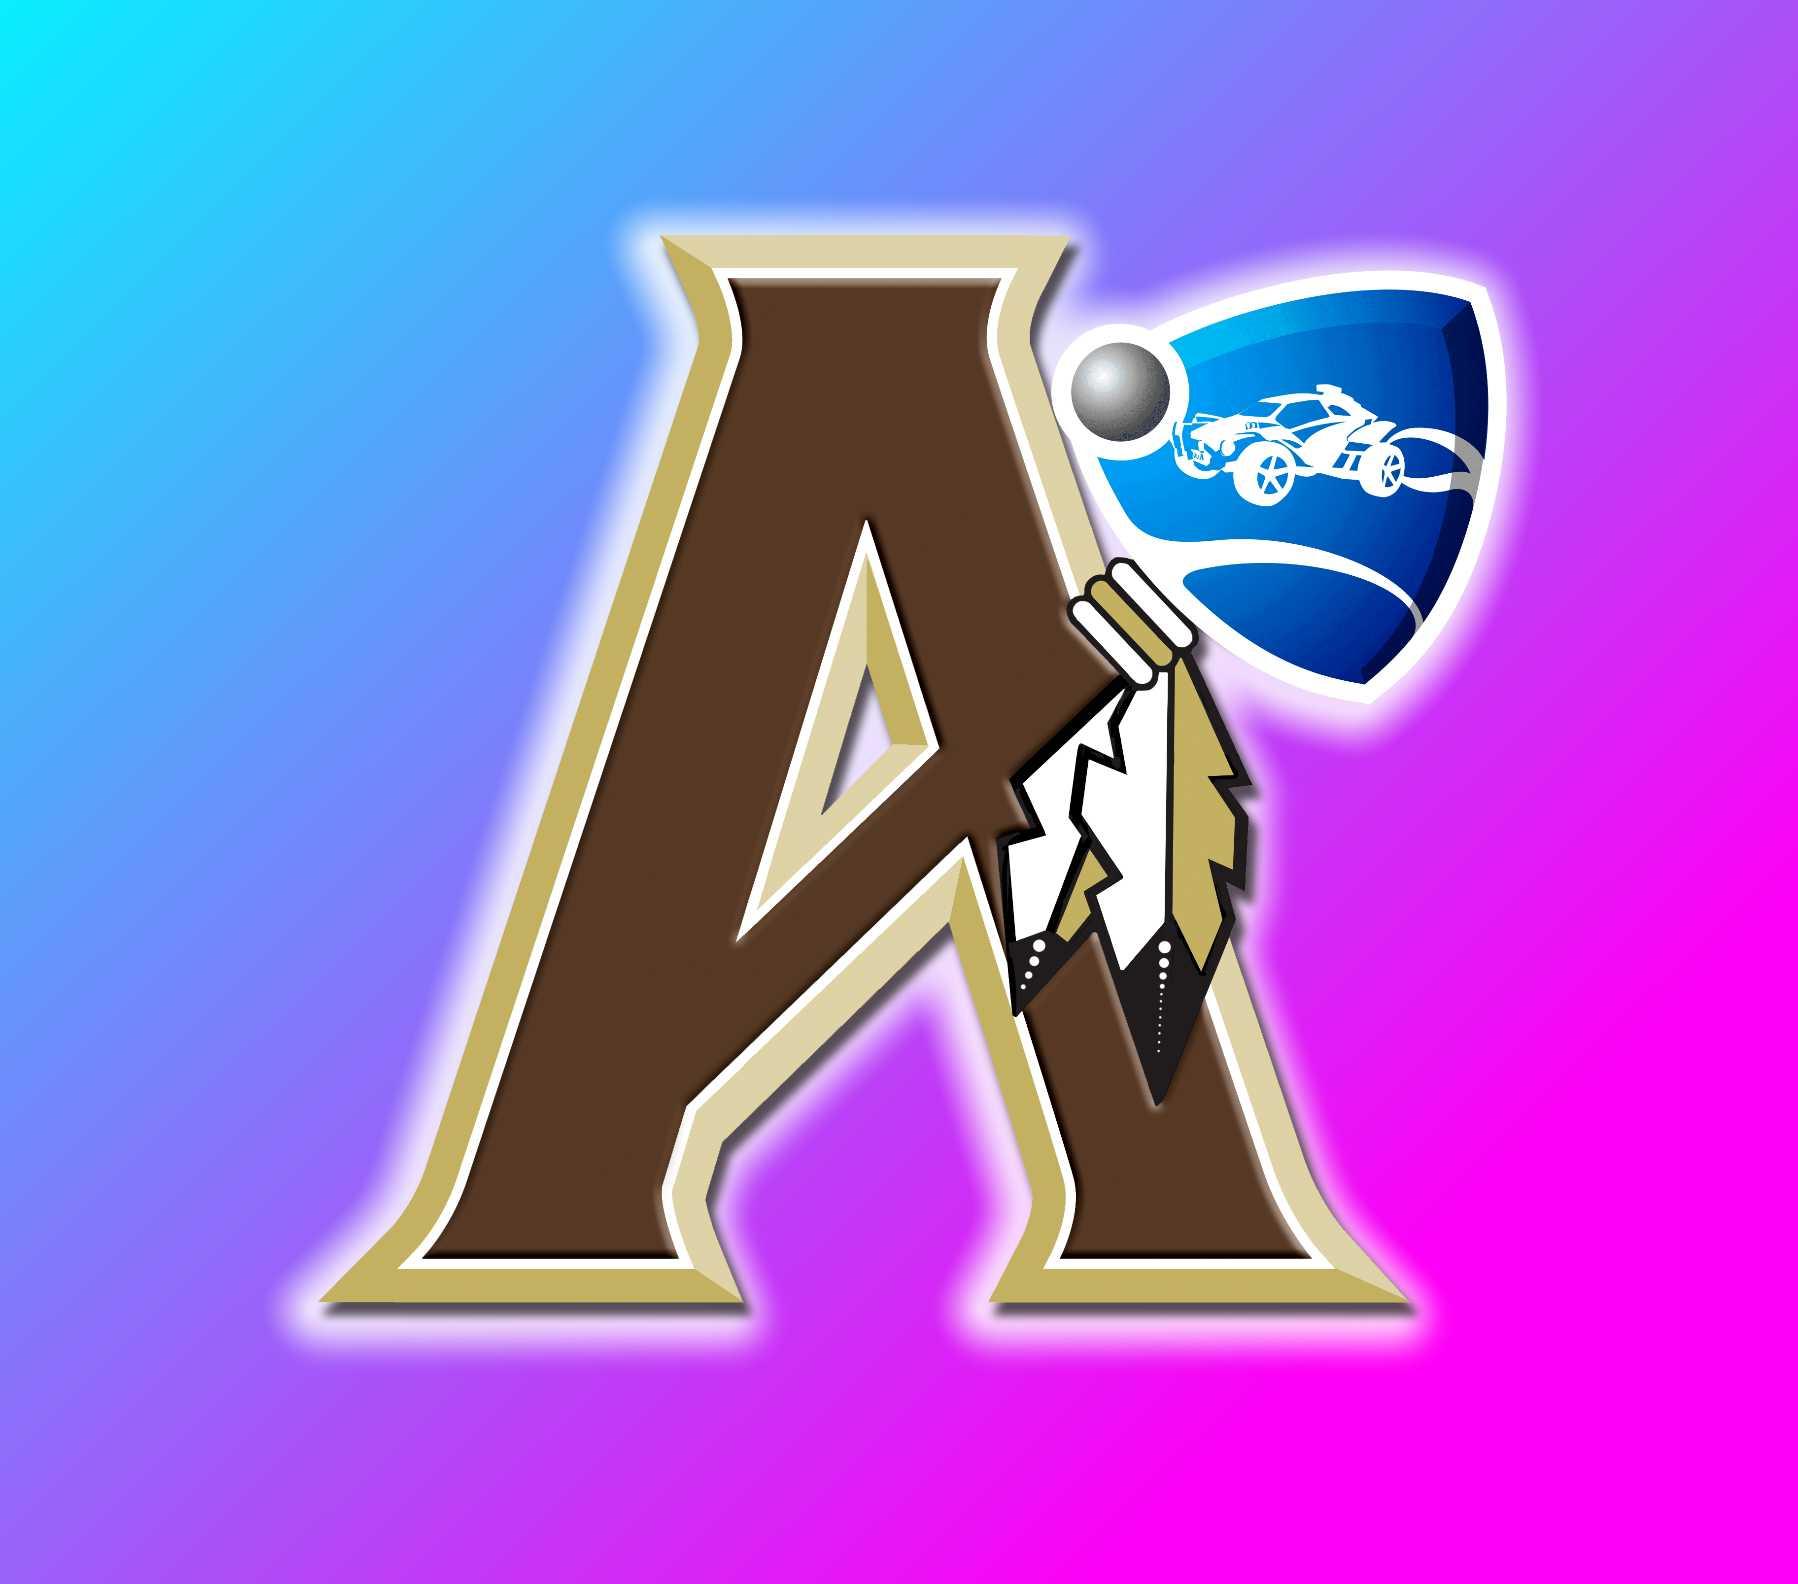 Absegami HS: Rocket League's logo